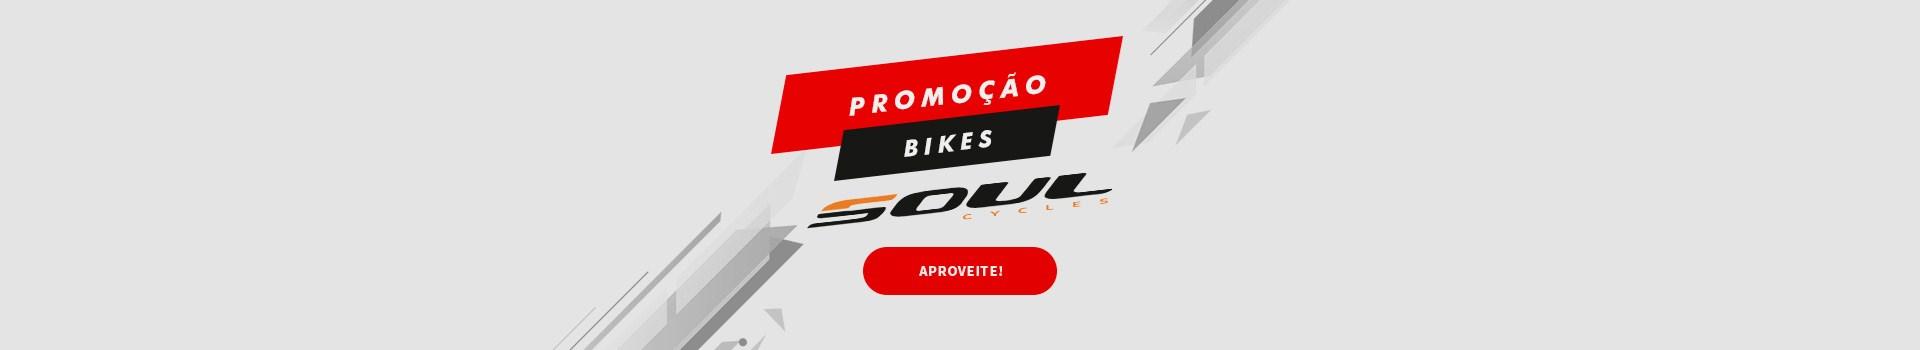 Promoão bikes Soul